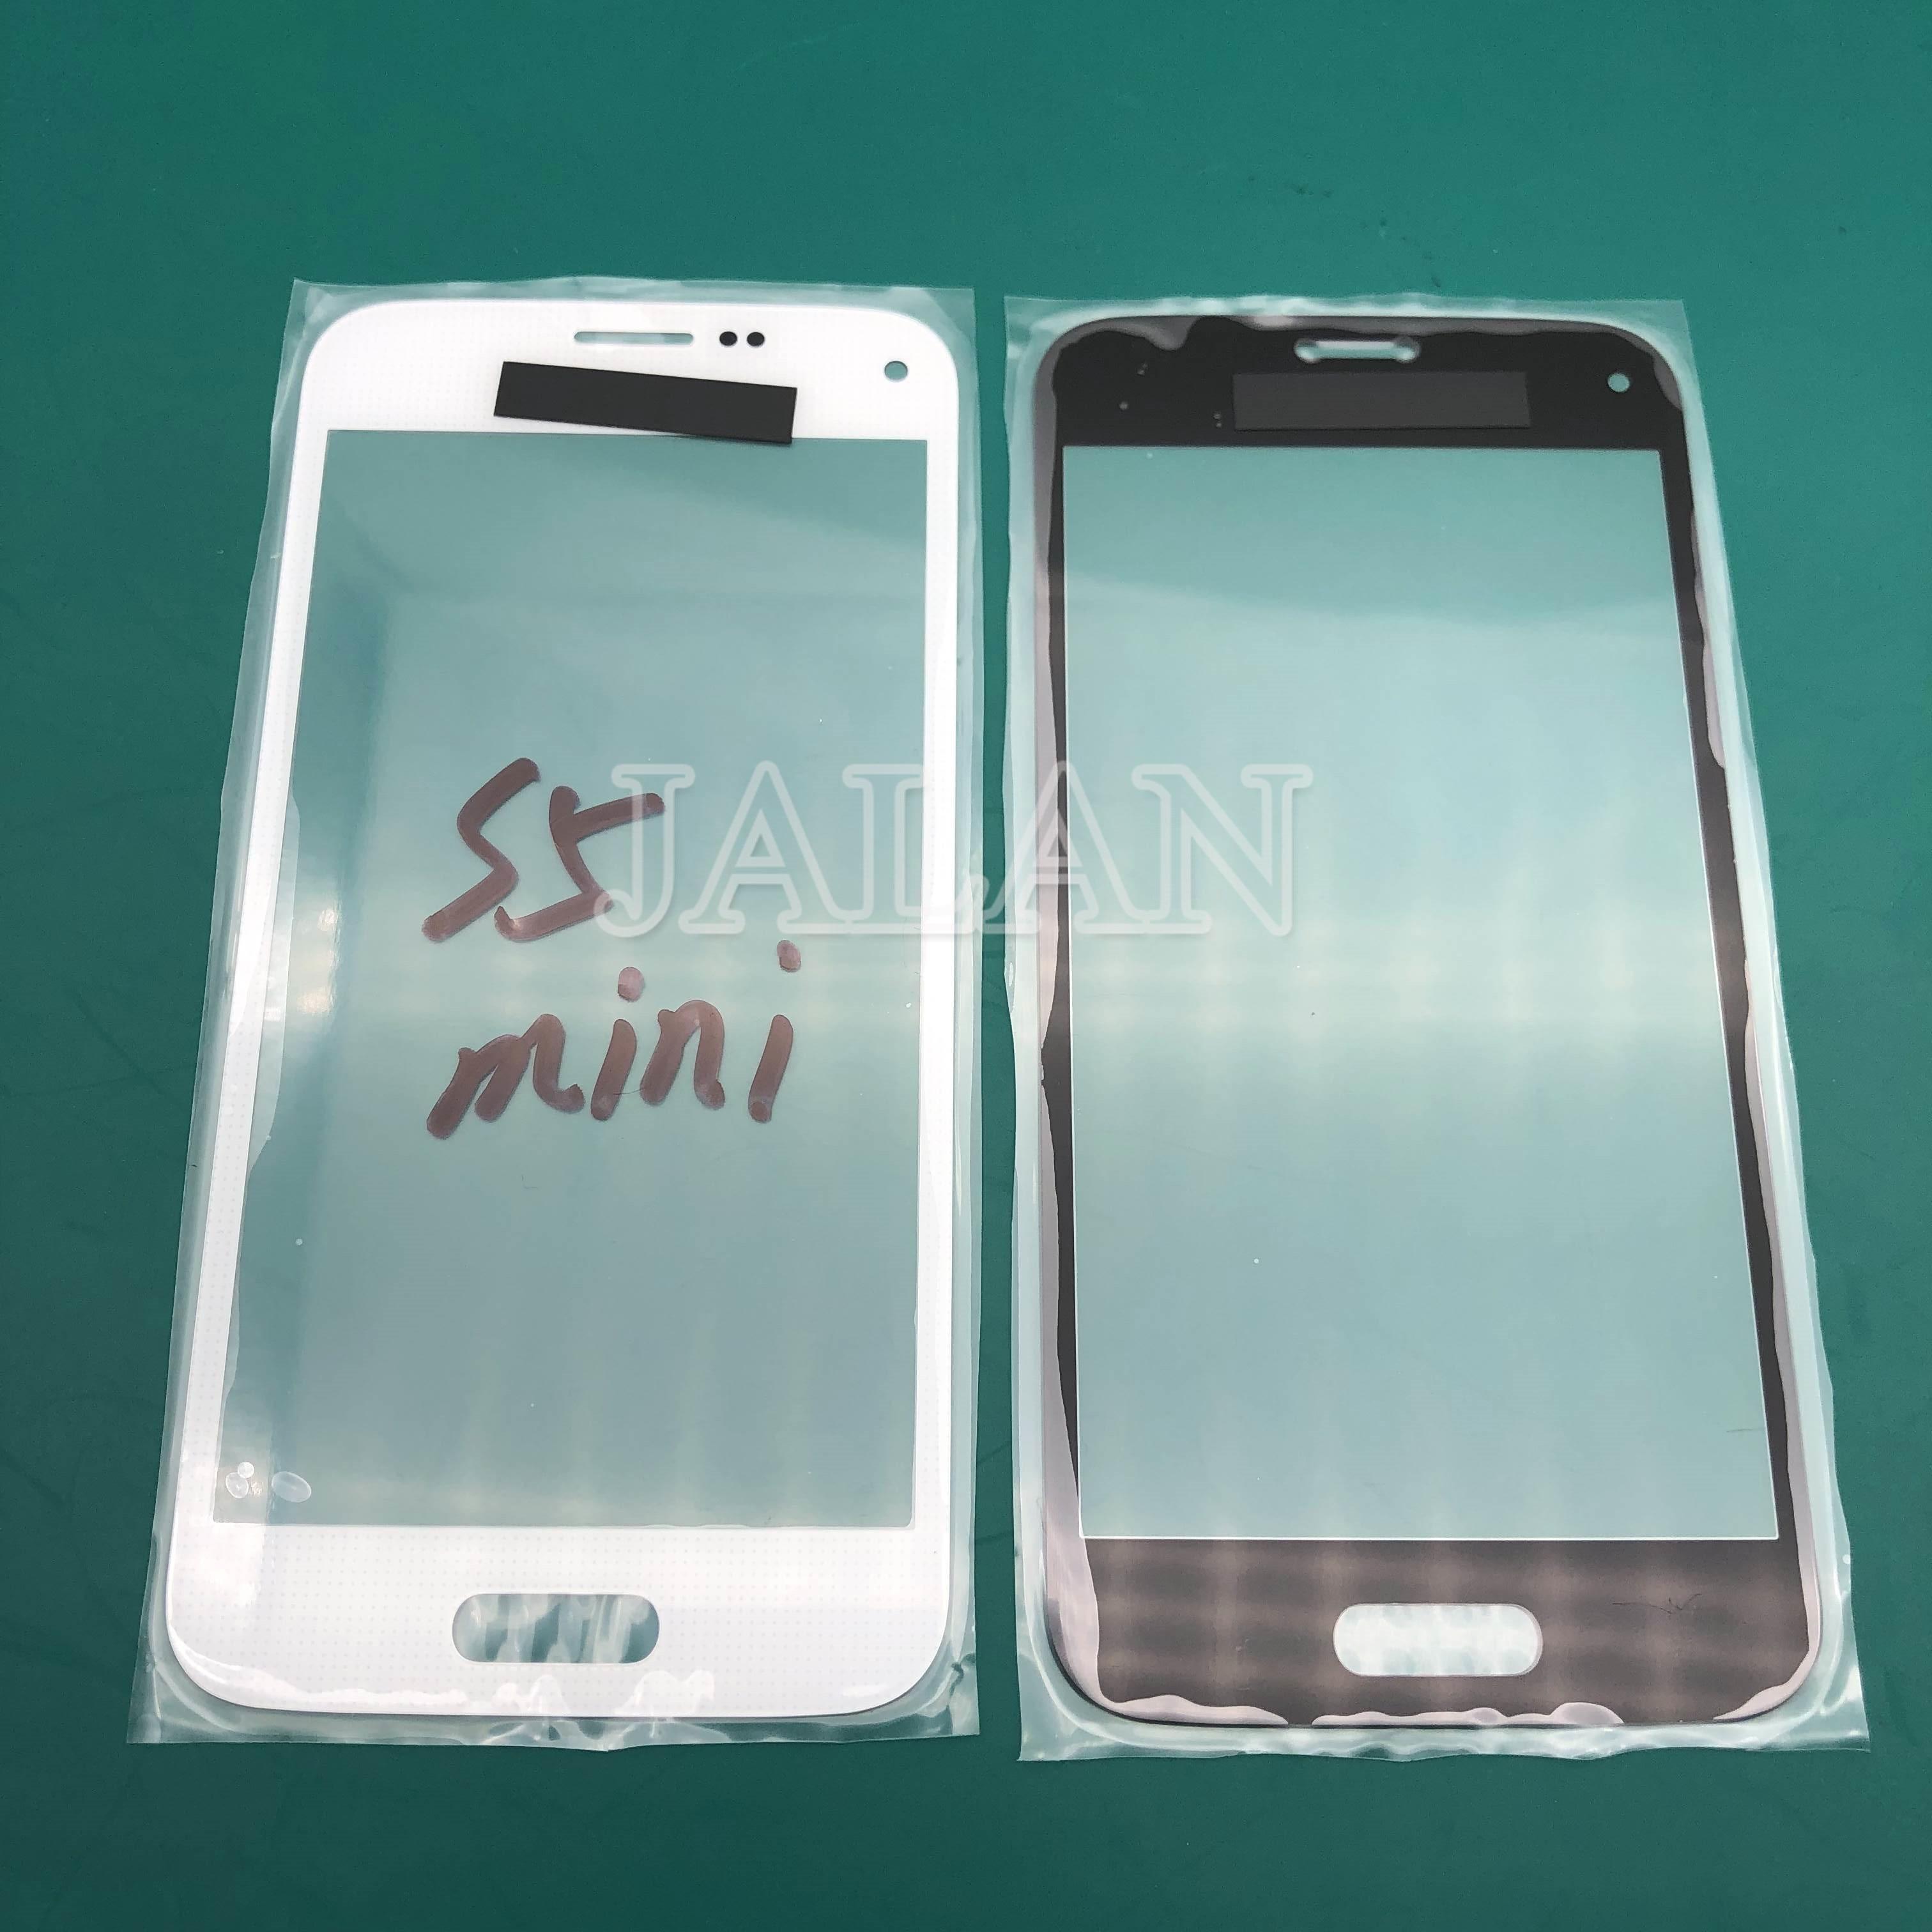 Jalan 5 Pcs untuk SM S5/S5 Mini/S5 Neo Depan Kaca Touch Panel G800 G900 G903 Retak kaca Pengganti Touchscreen Perbaikan